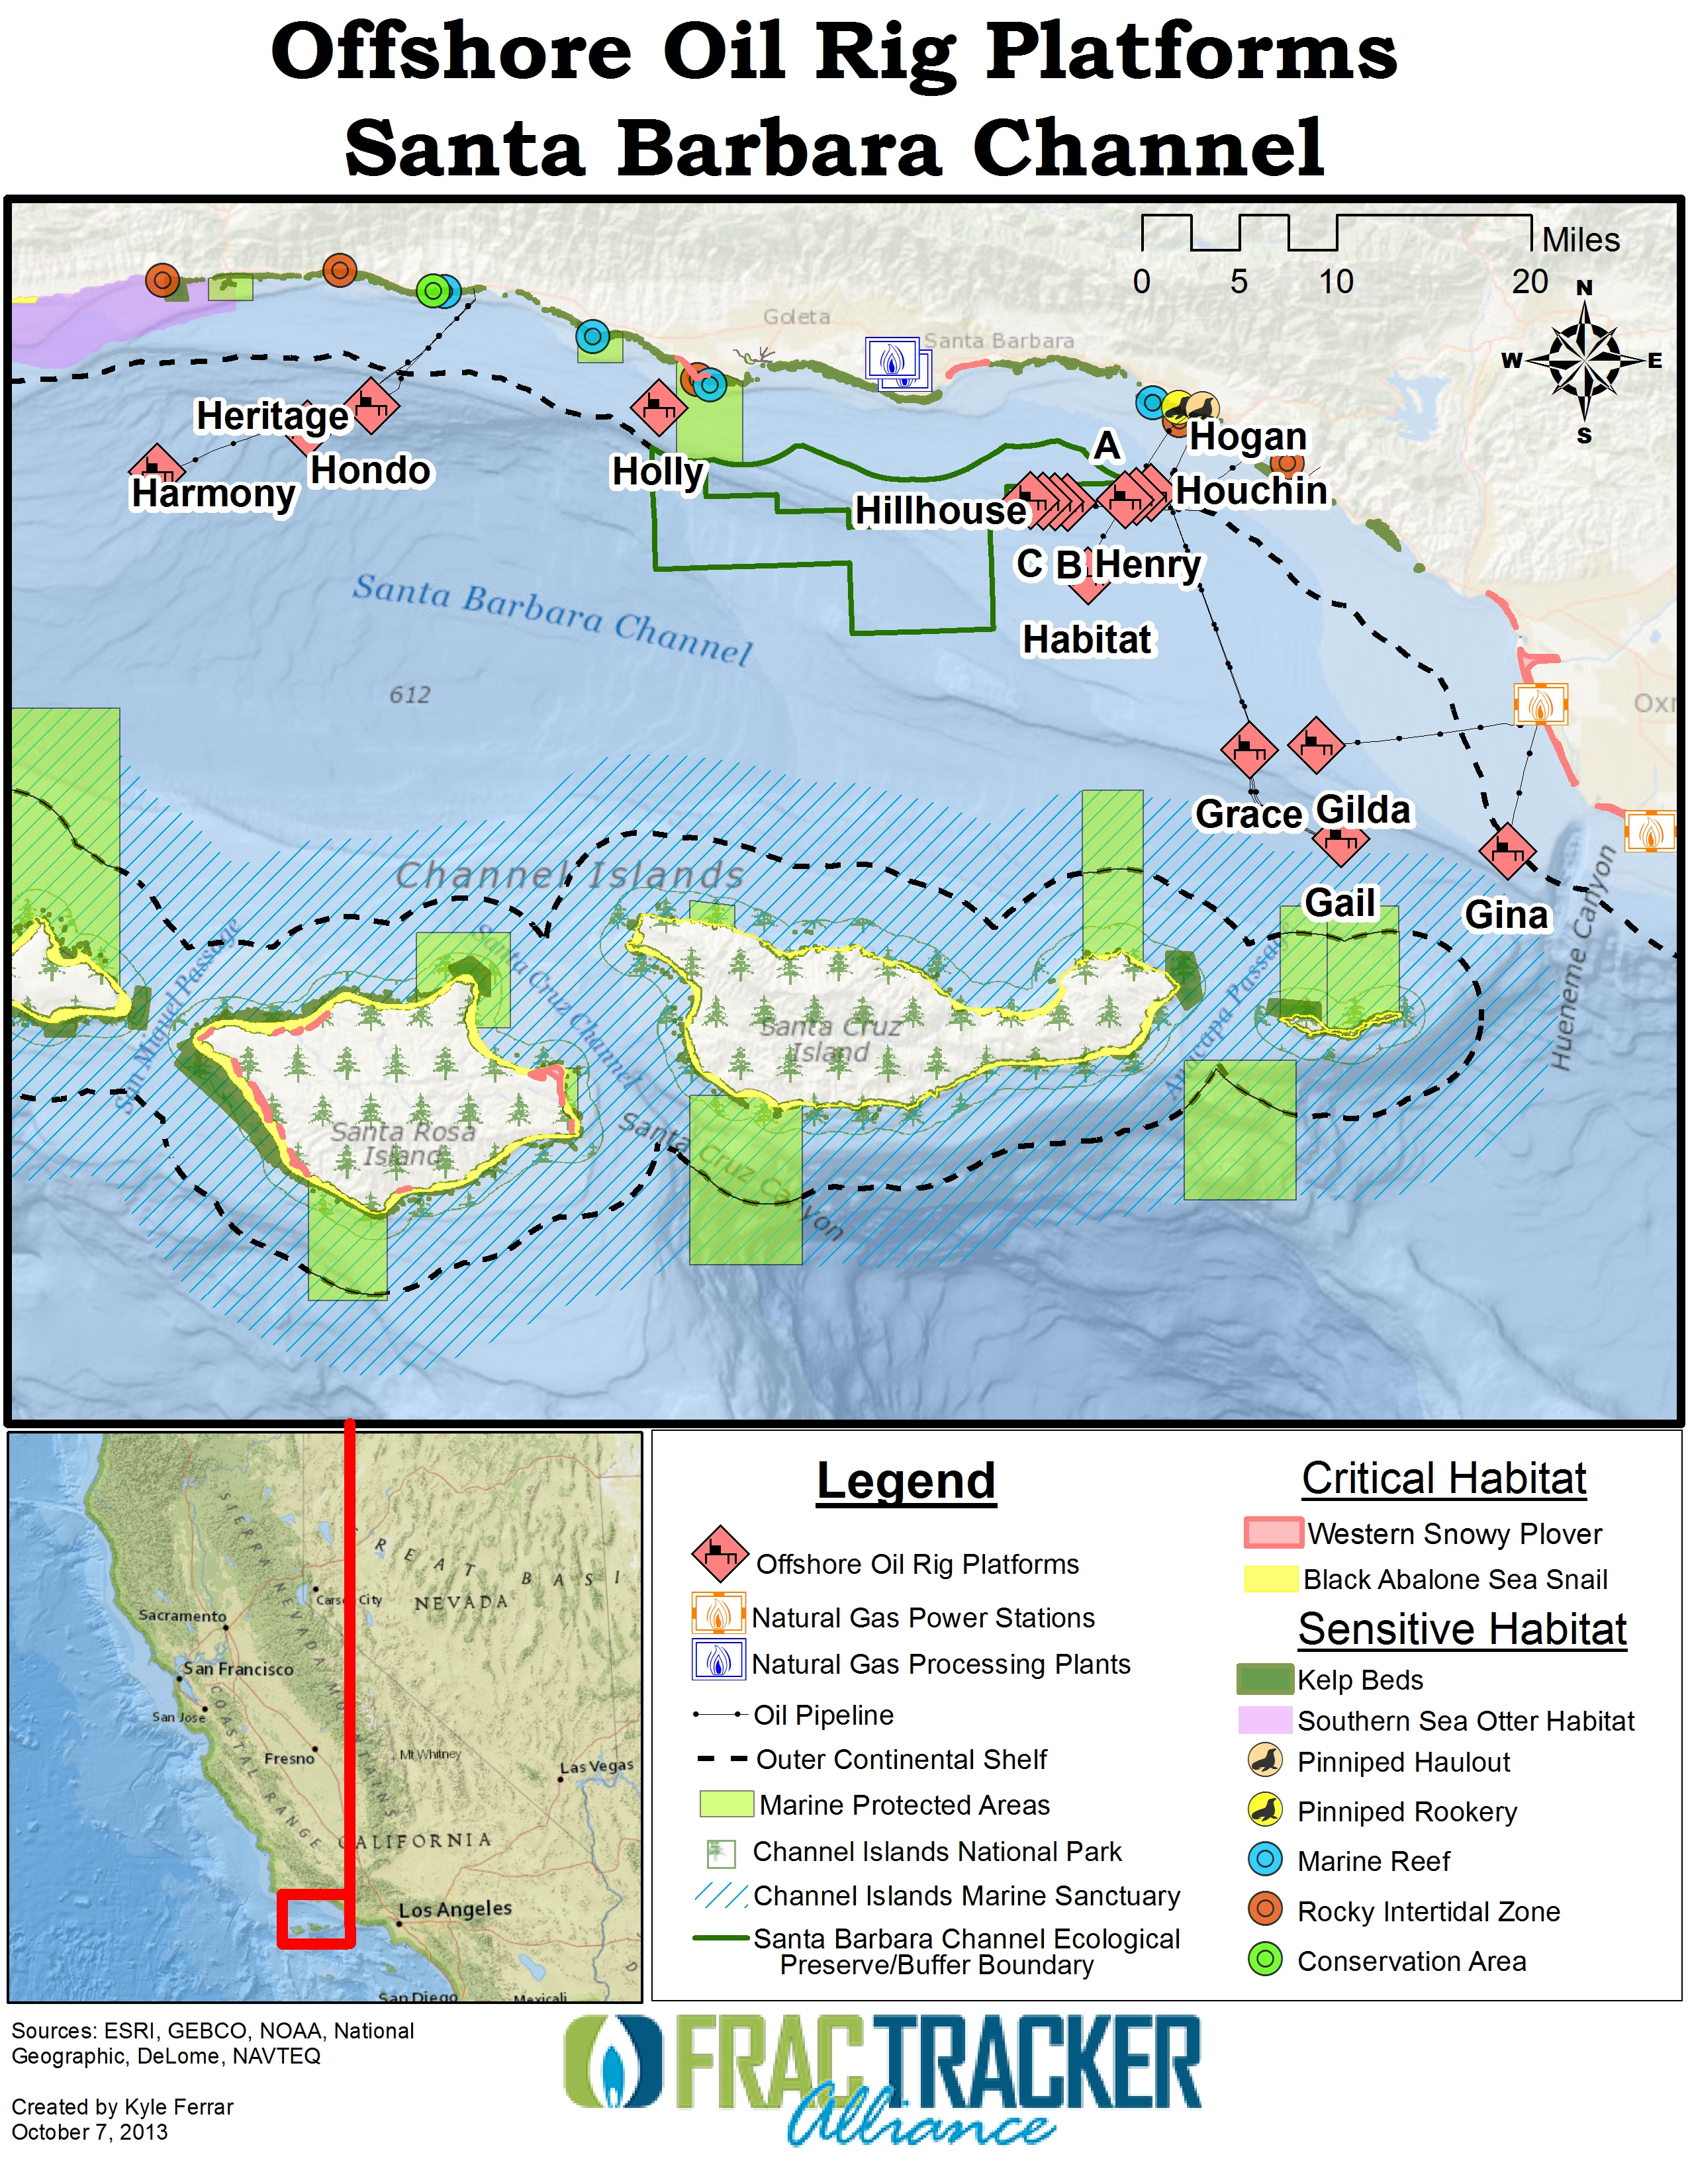 Santa Barbara Channel Maps Of California Fracking In California Map - Fracking In California Map